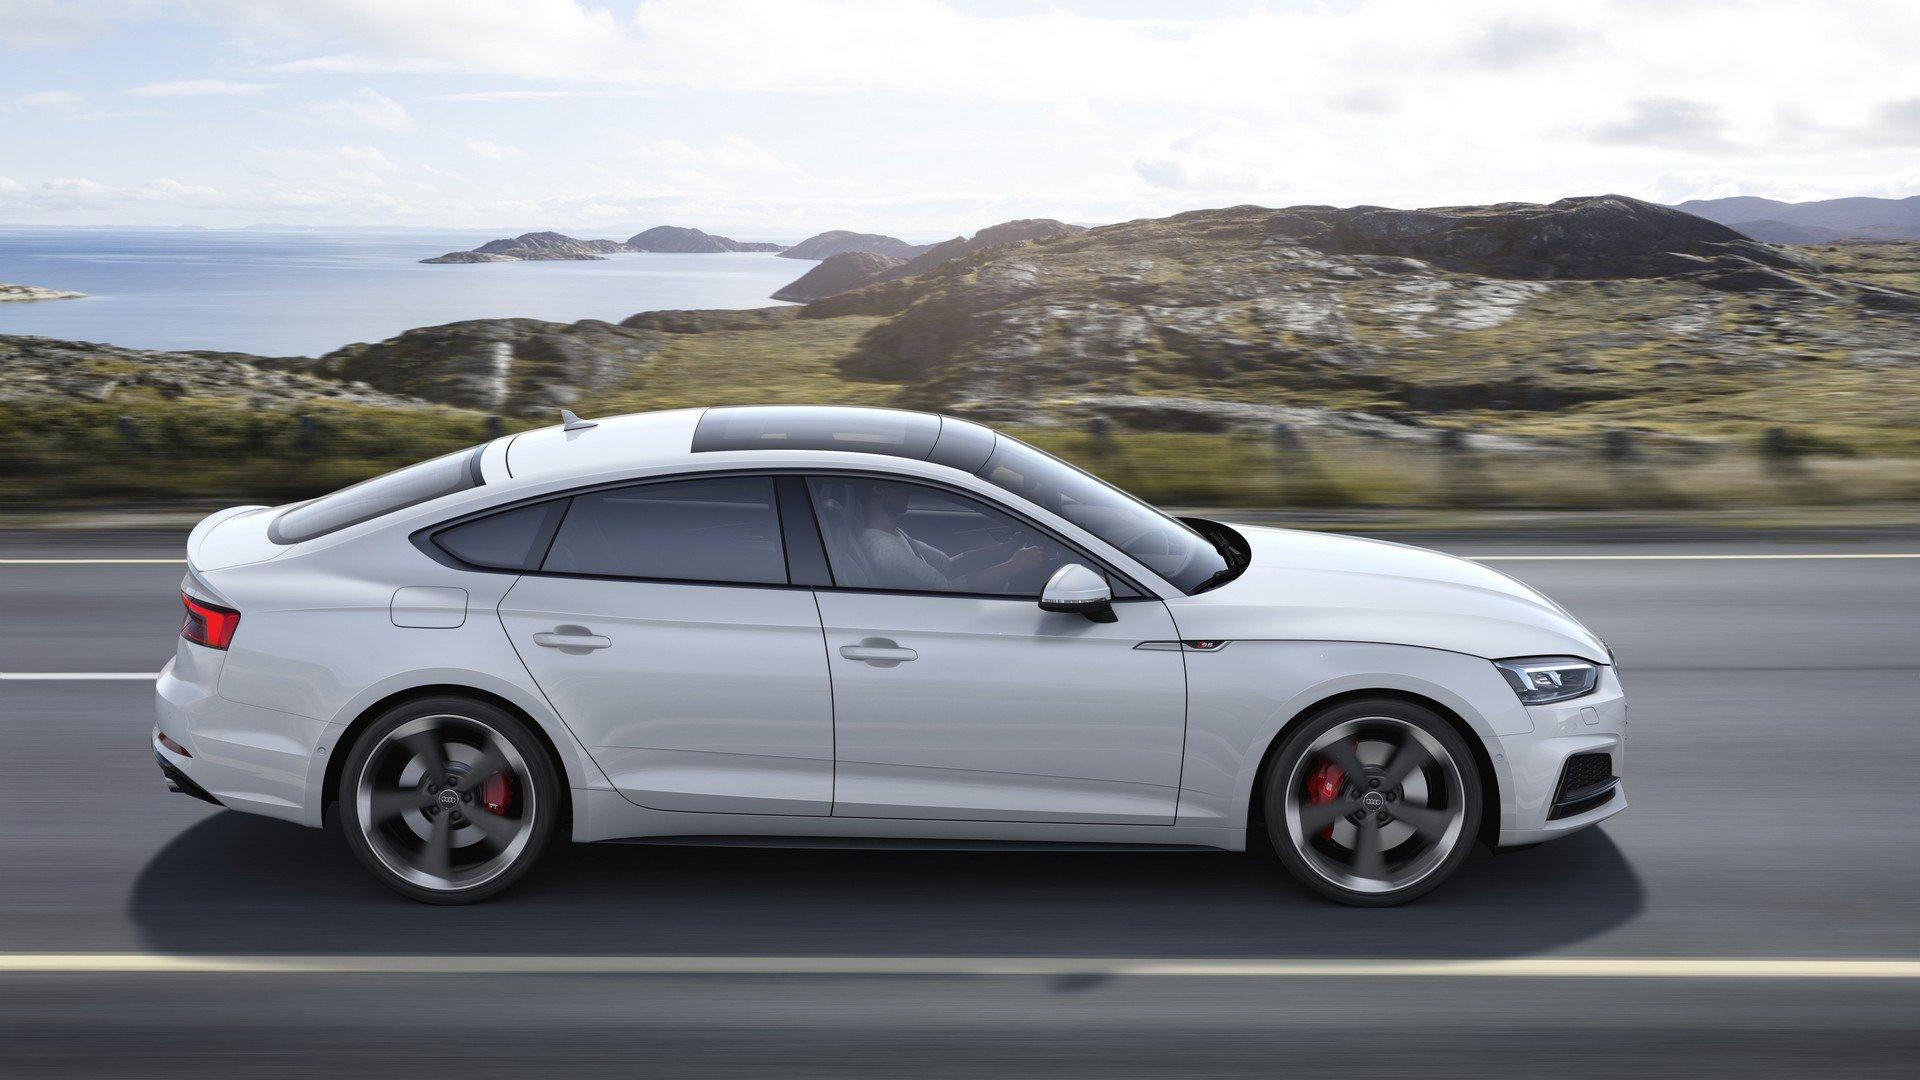 Kekurangan Audi S5 Tdi Harga